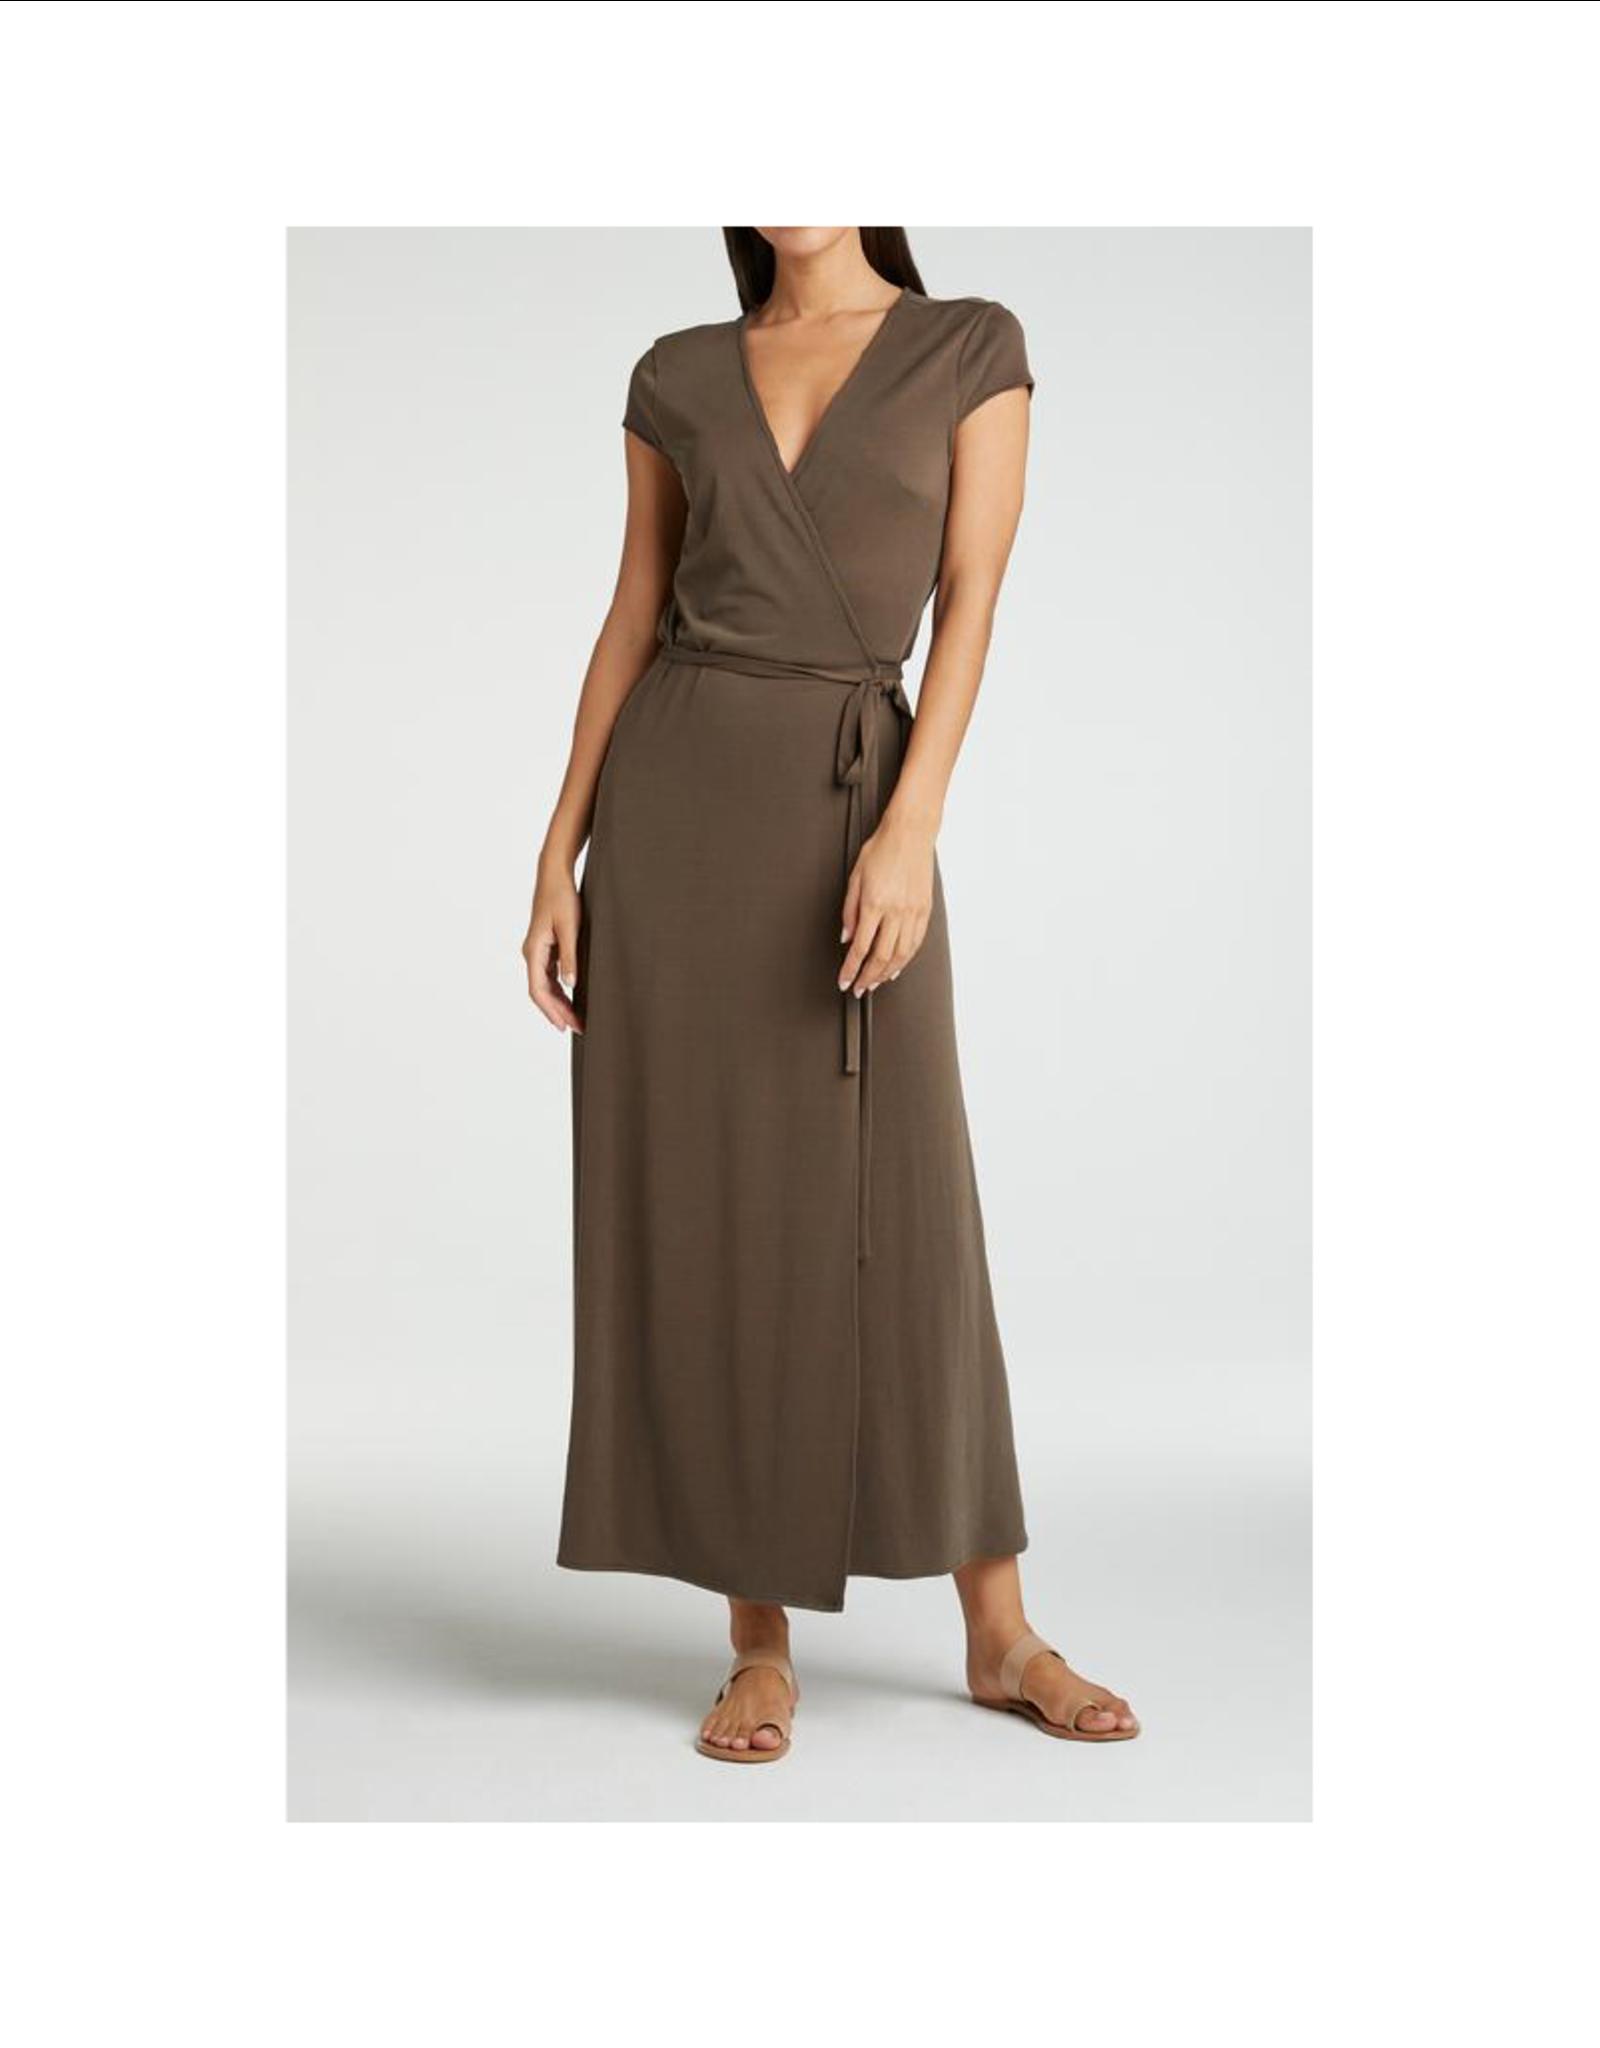 YaYa Modal Jersey Wrap Dress